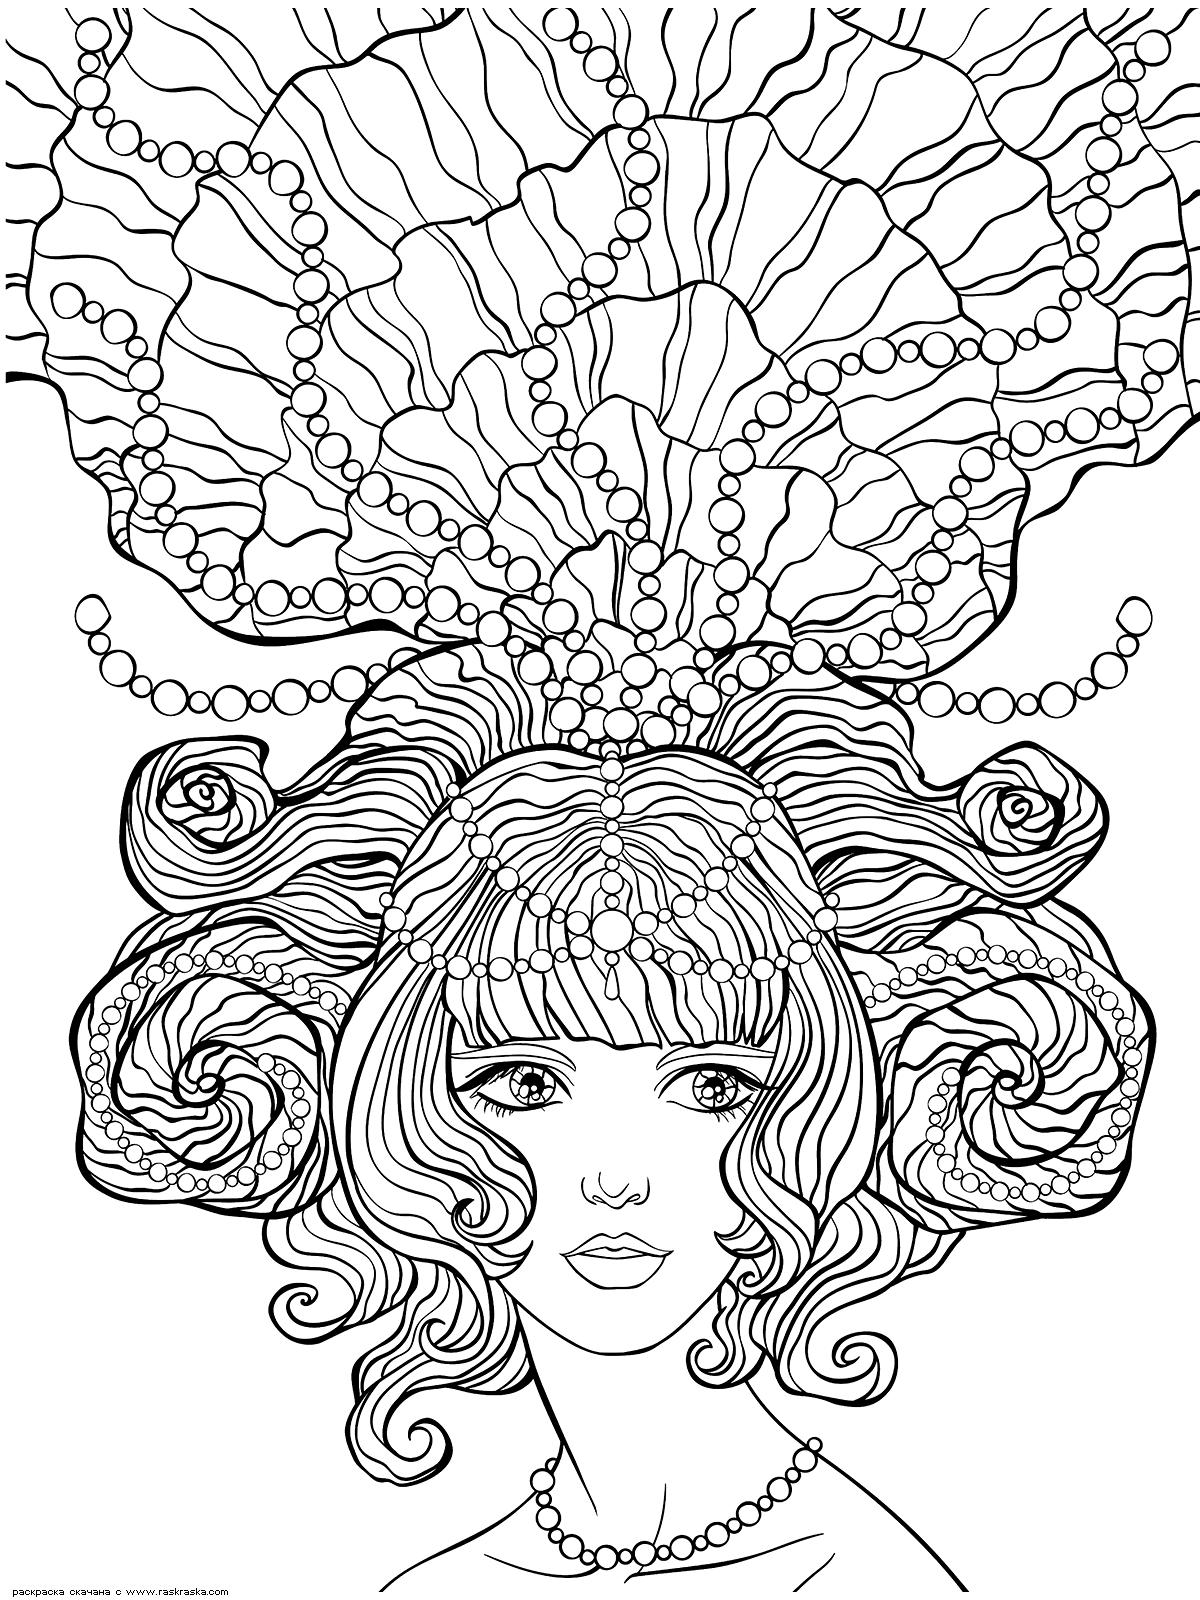 Раскраска Морская принцесса. Раскраска антистресс